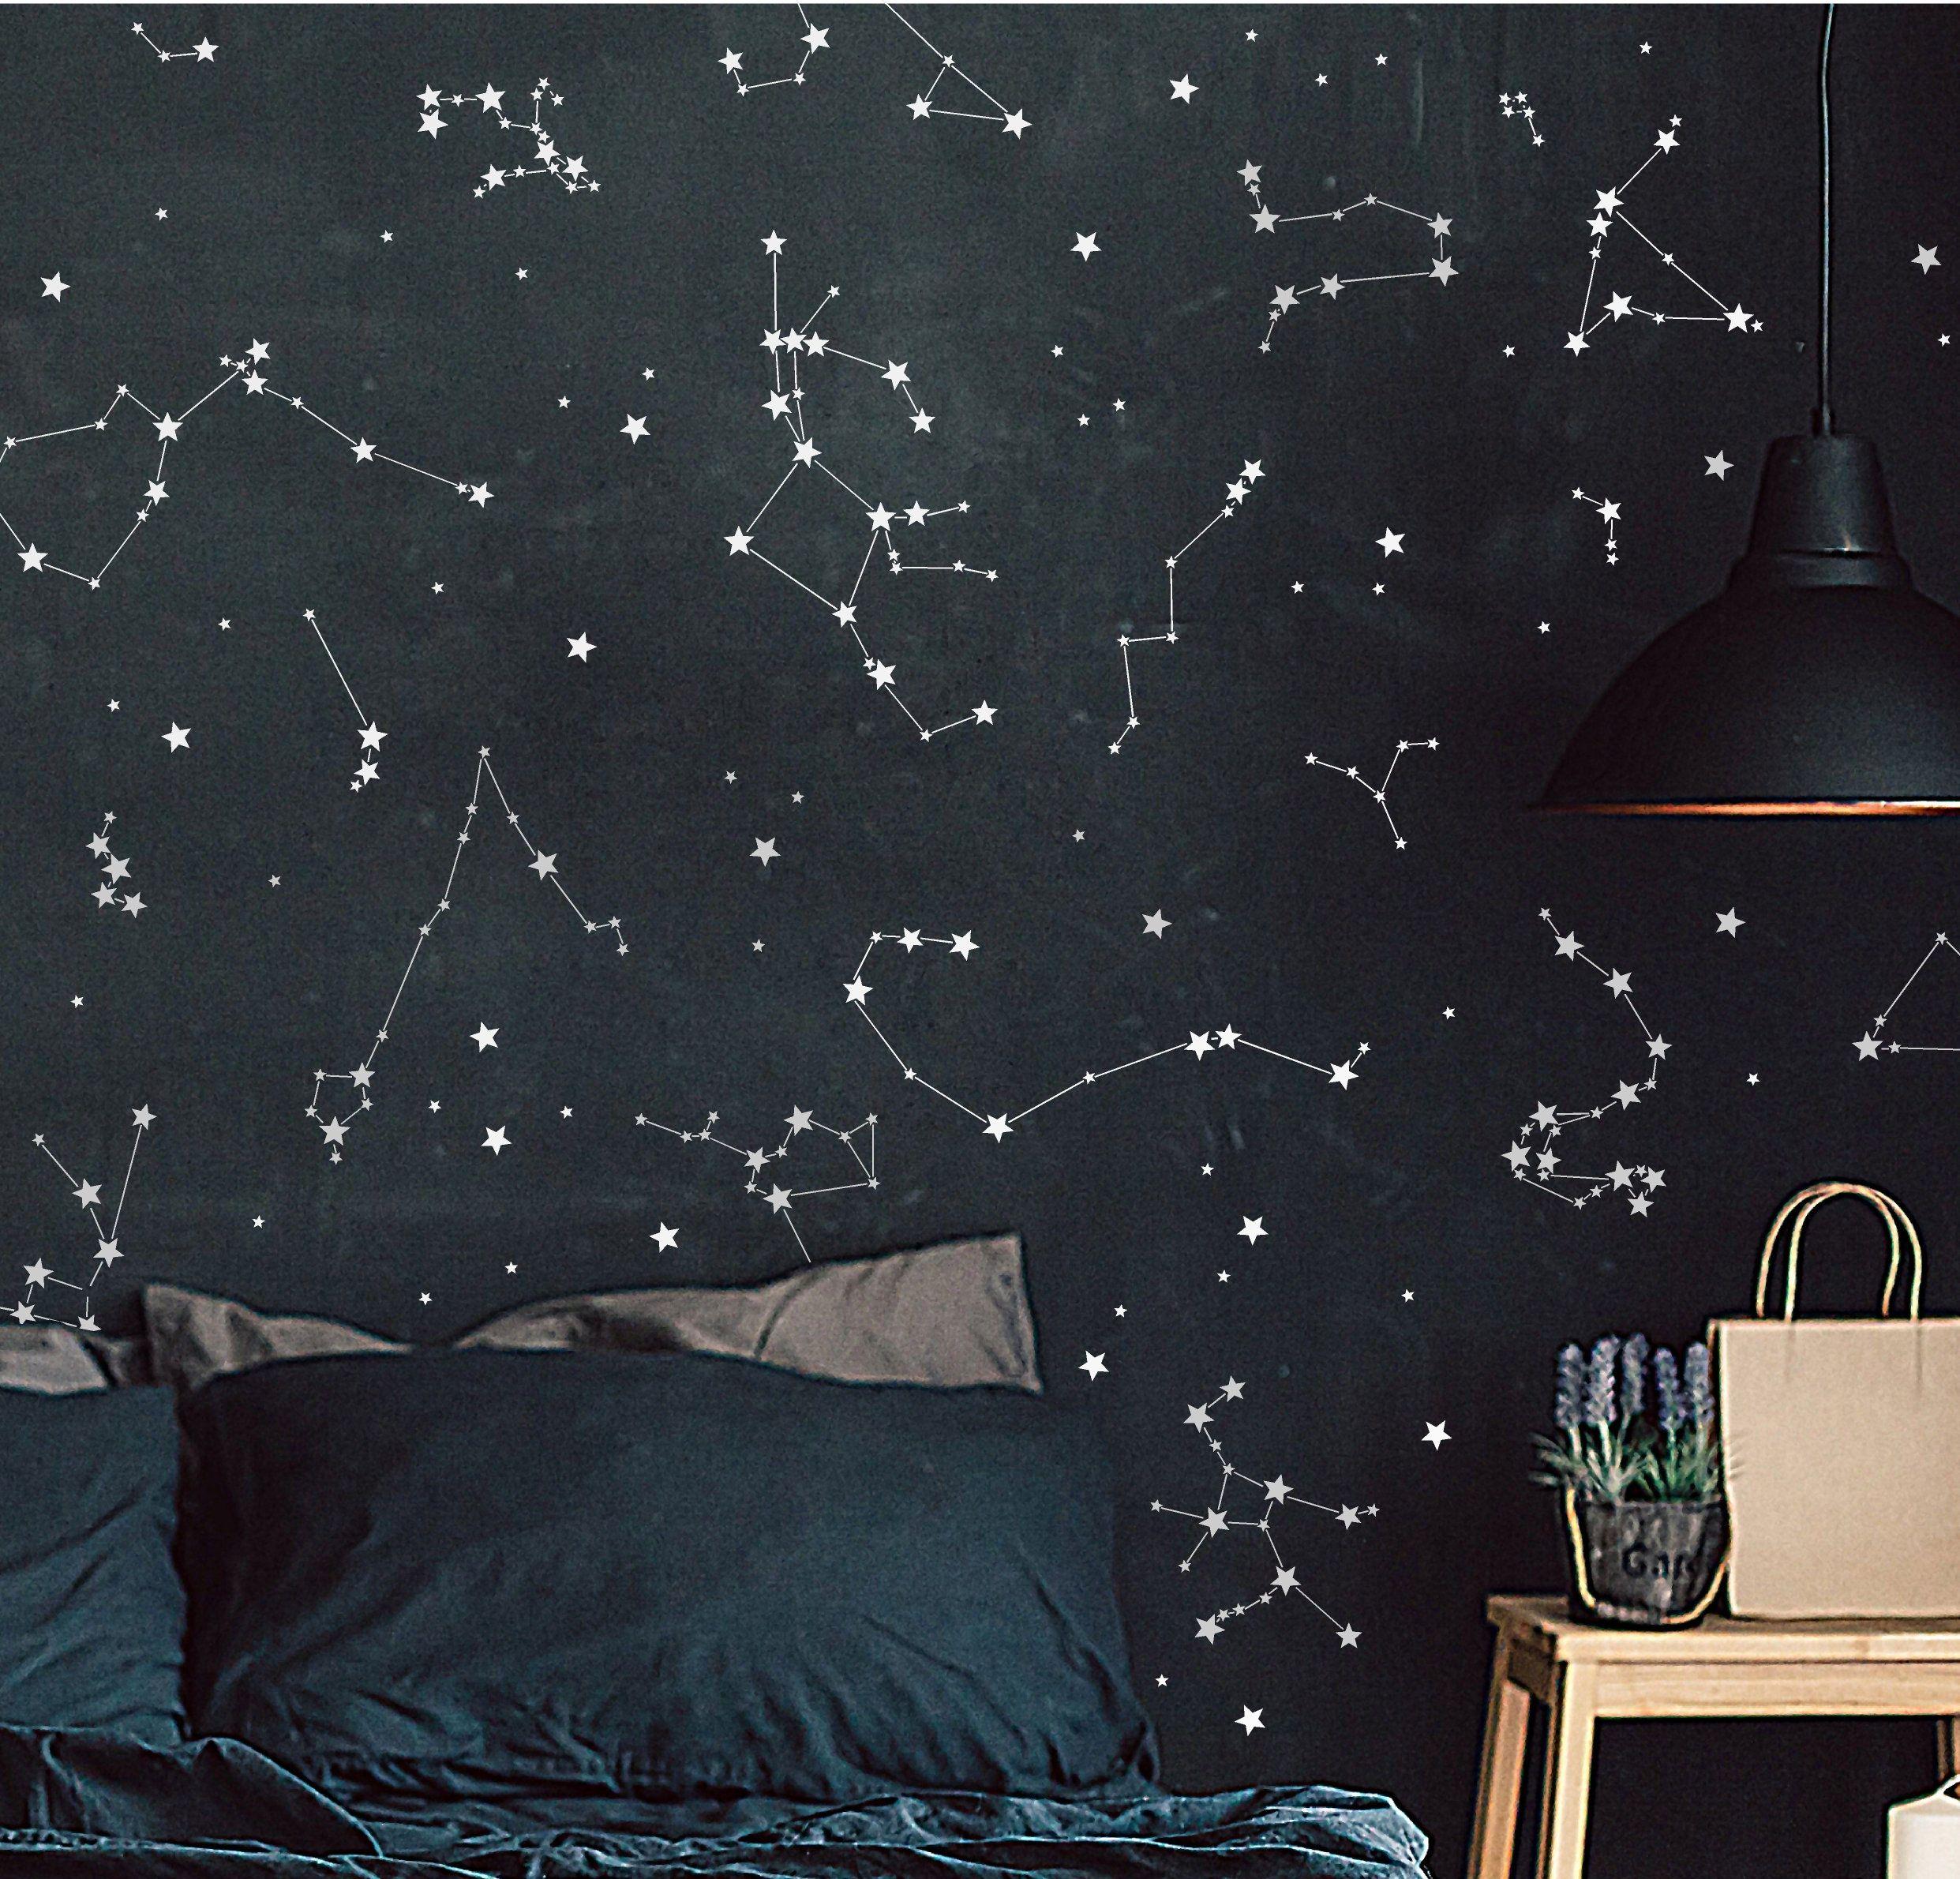 Constellation Stickers Constellation Decals Astronomy Wall Art Constellation Star Map N Constellation Wall Decal Constellation Decal Constellation Wall Art